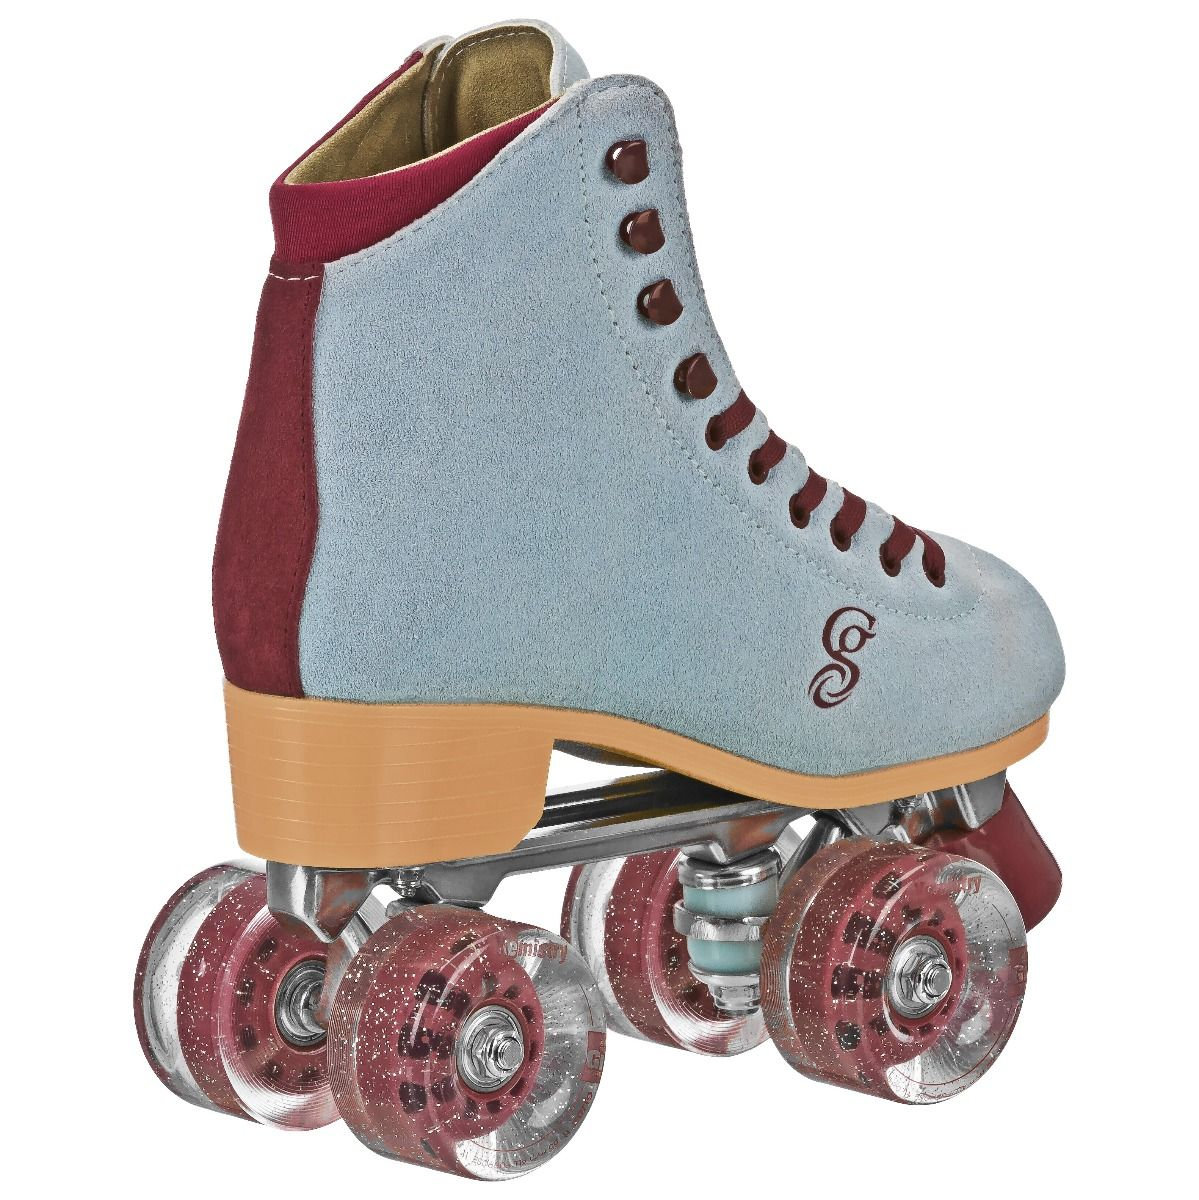 Teal Candi Grl Carlin Quad Roller Skates